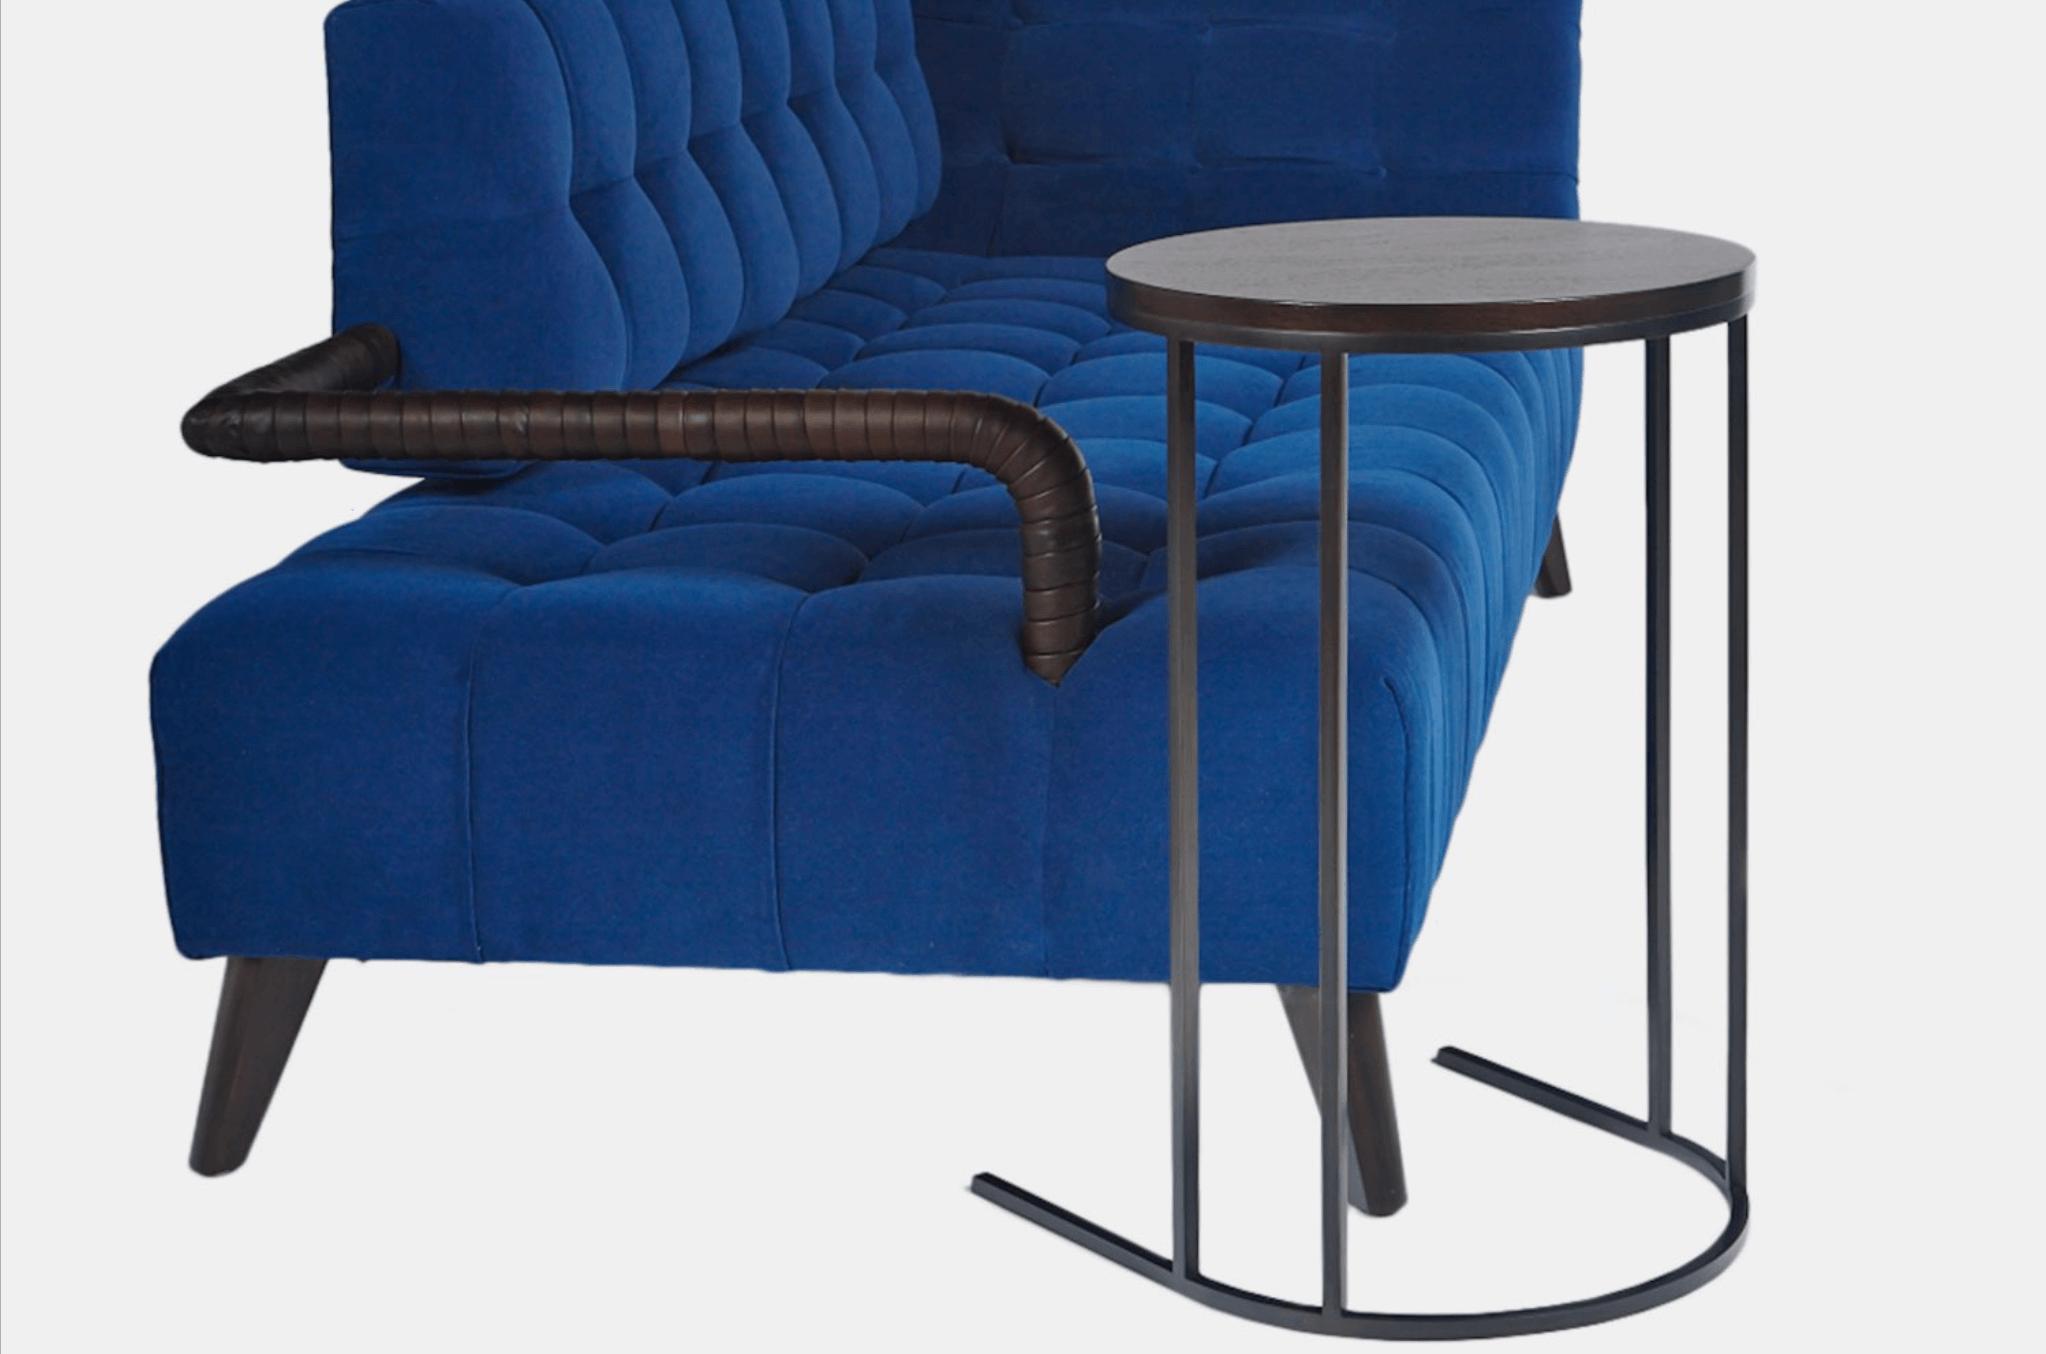 Aguirre+Design+-+Jisu+Side+Table+-+Walnut+and+Blackened+Steel (1).png